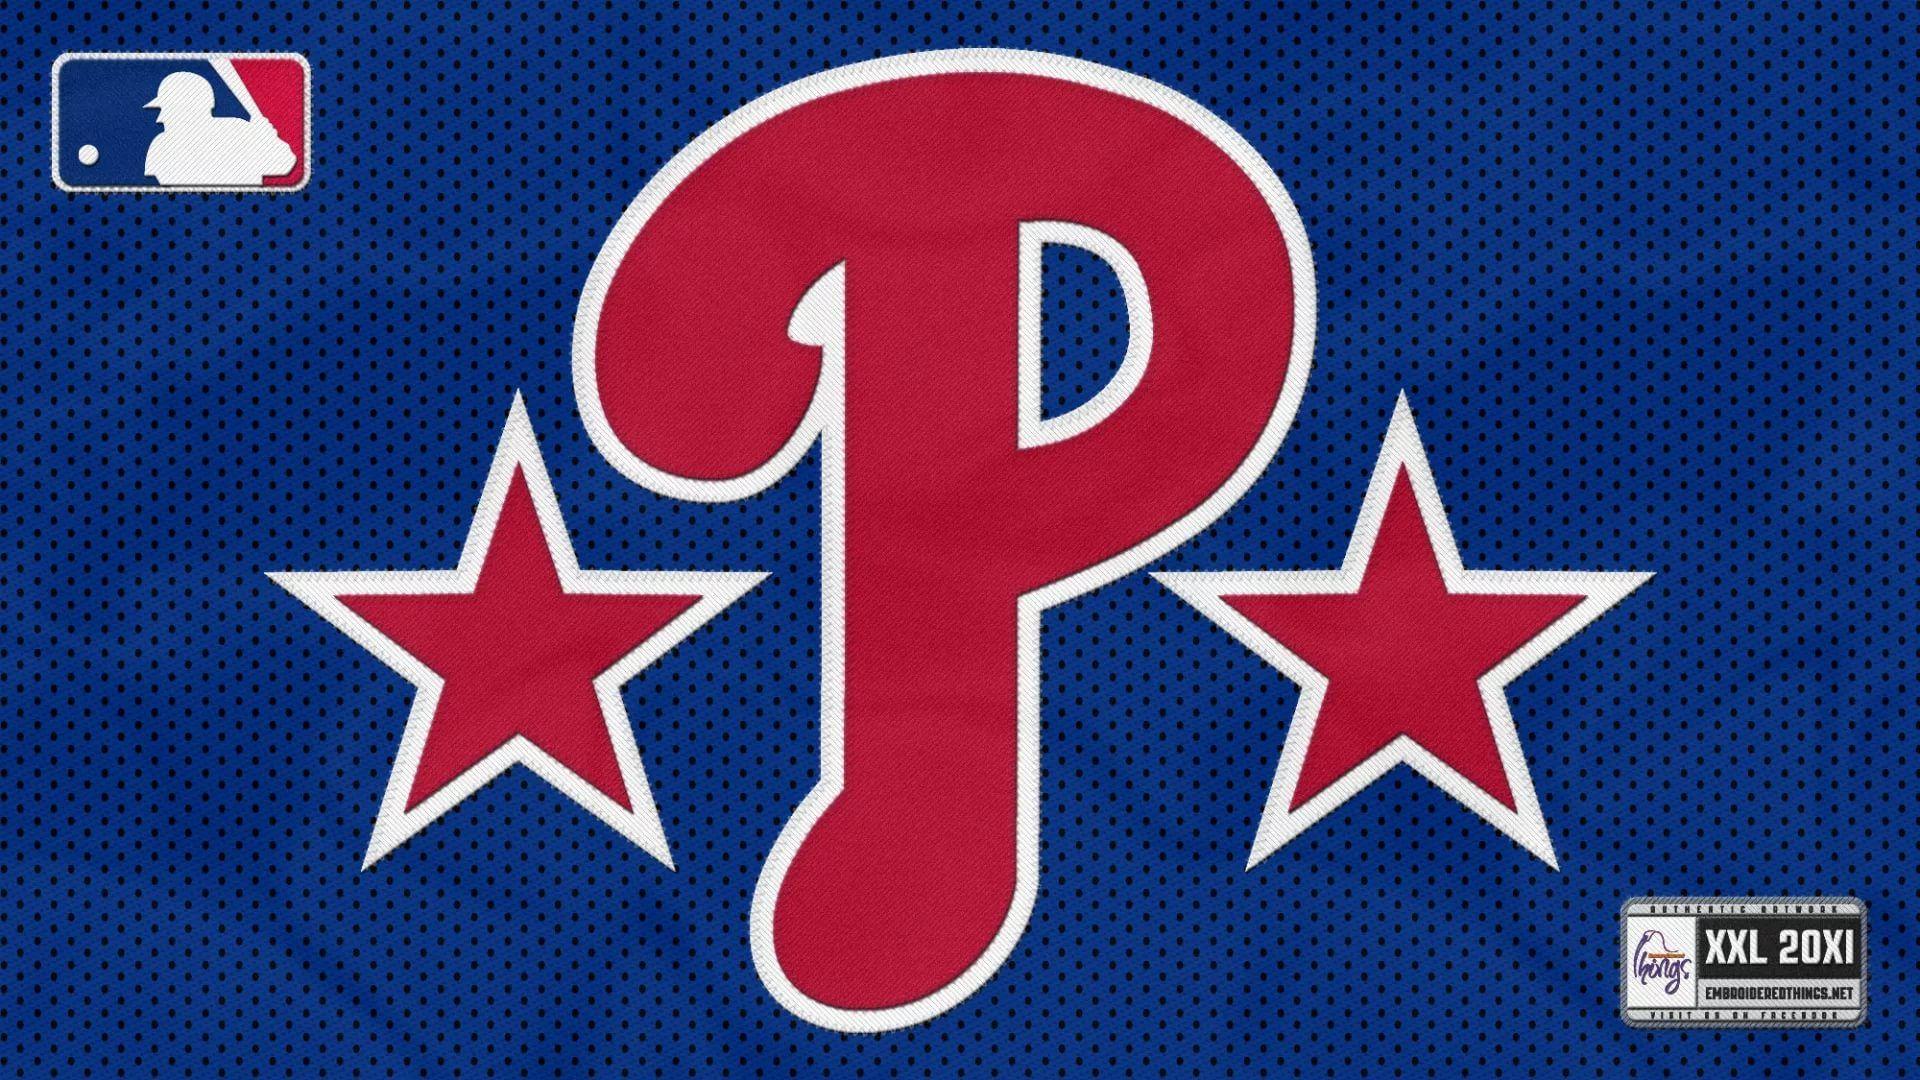 Phillies Logo Wallpaper Image